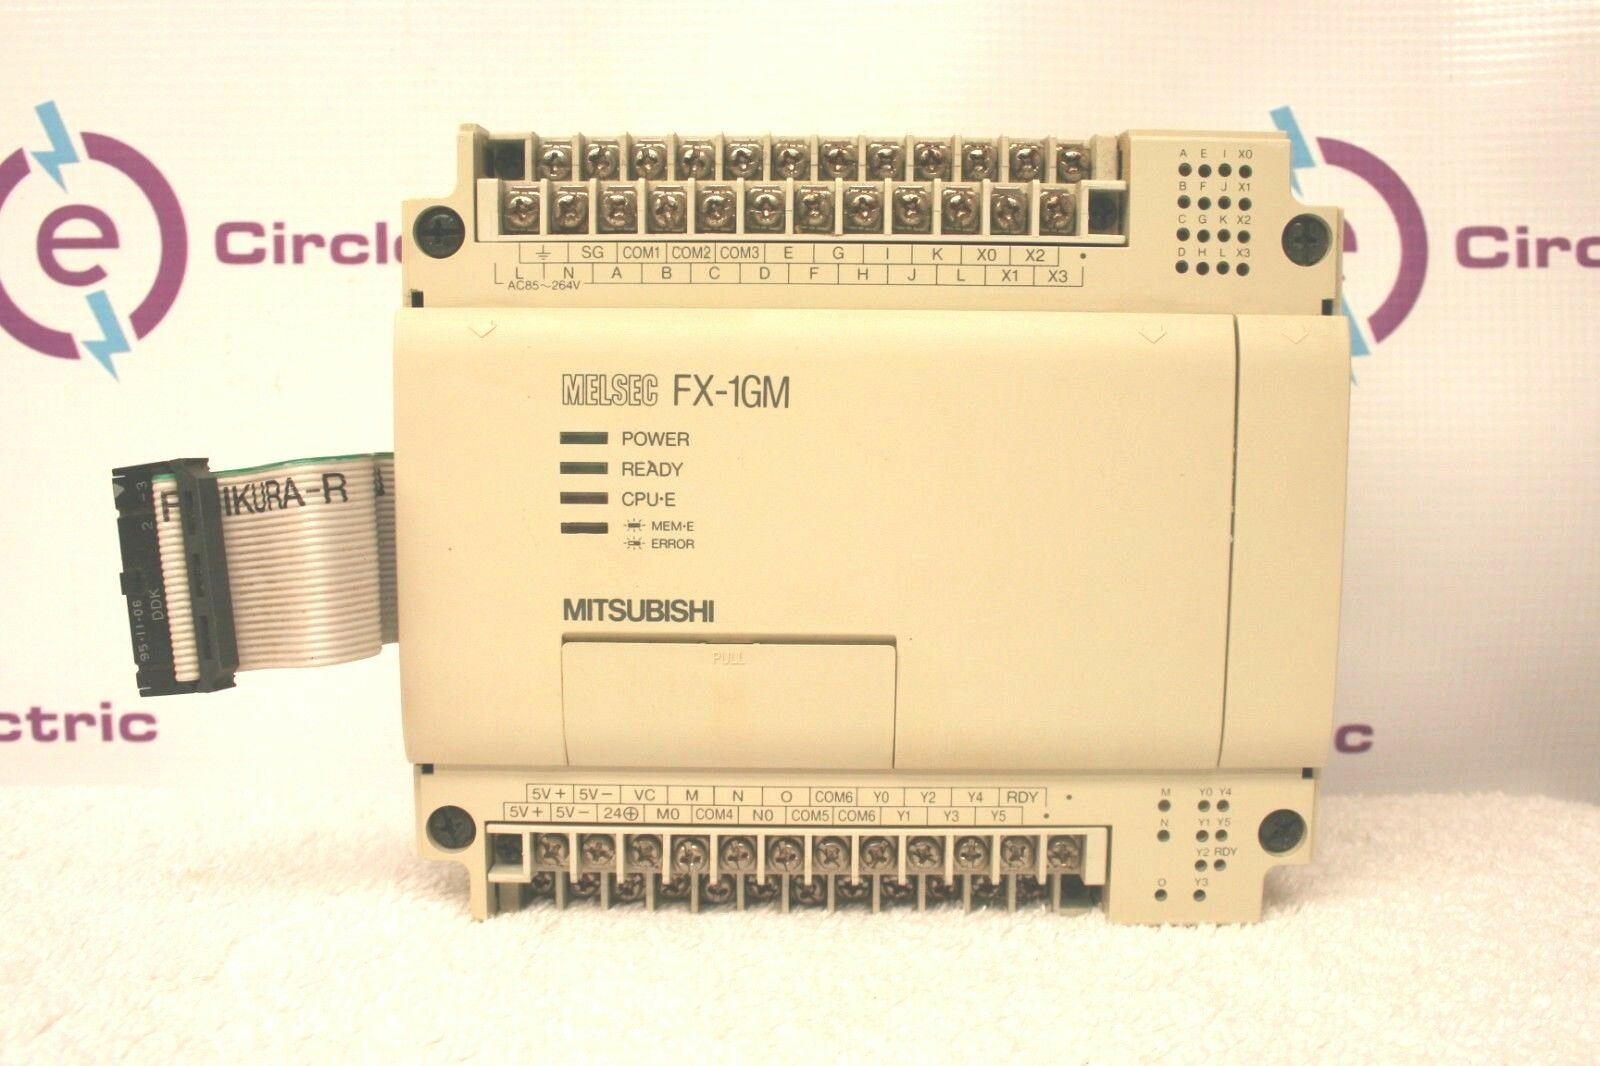 Mitsubishi FX-1GM Programmable Controller XLNT